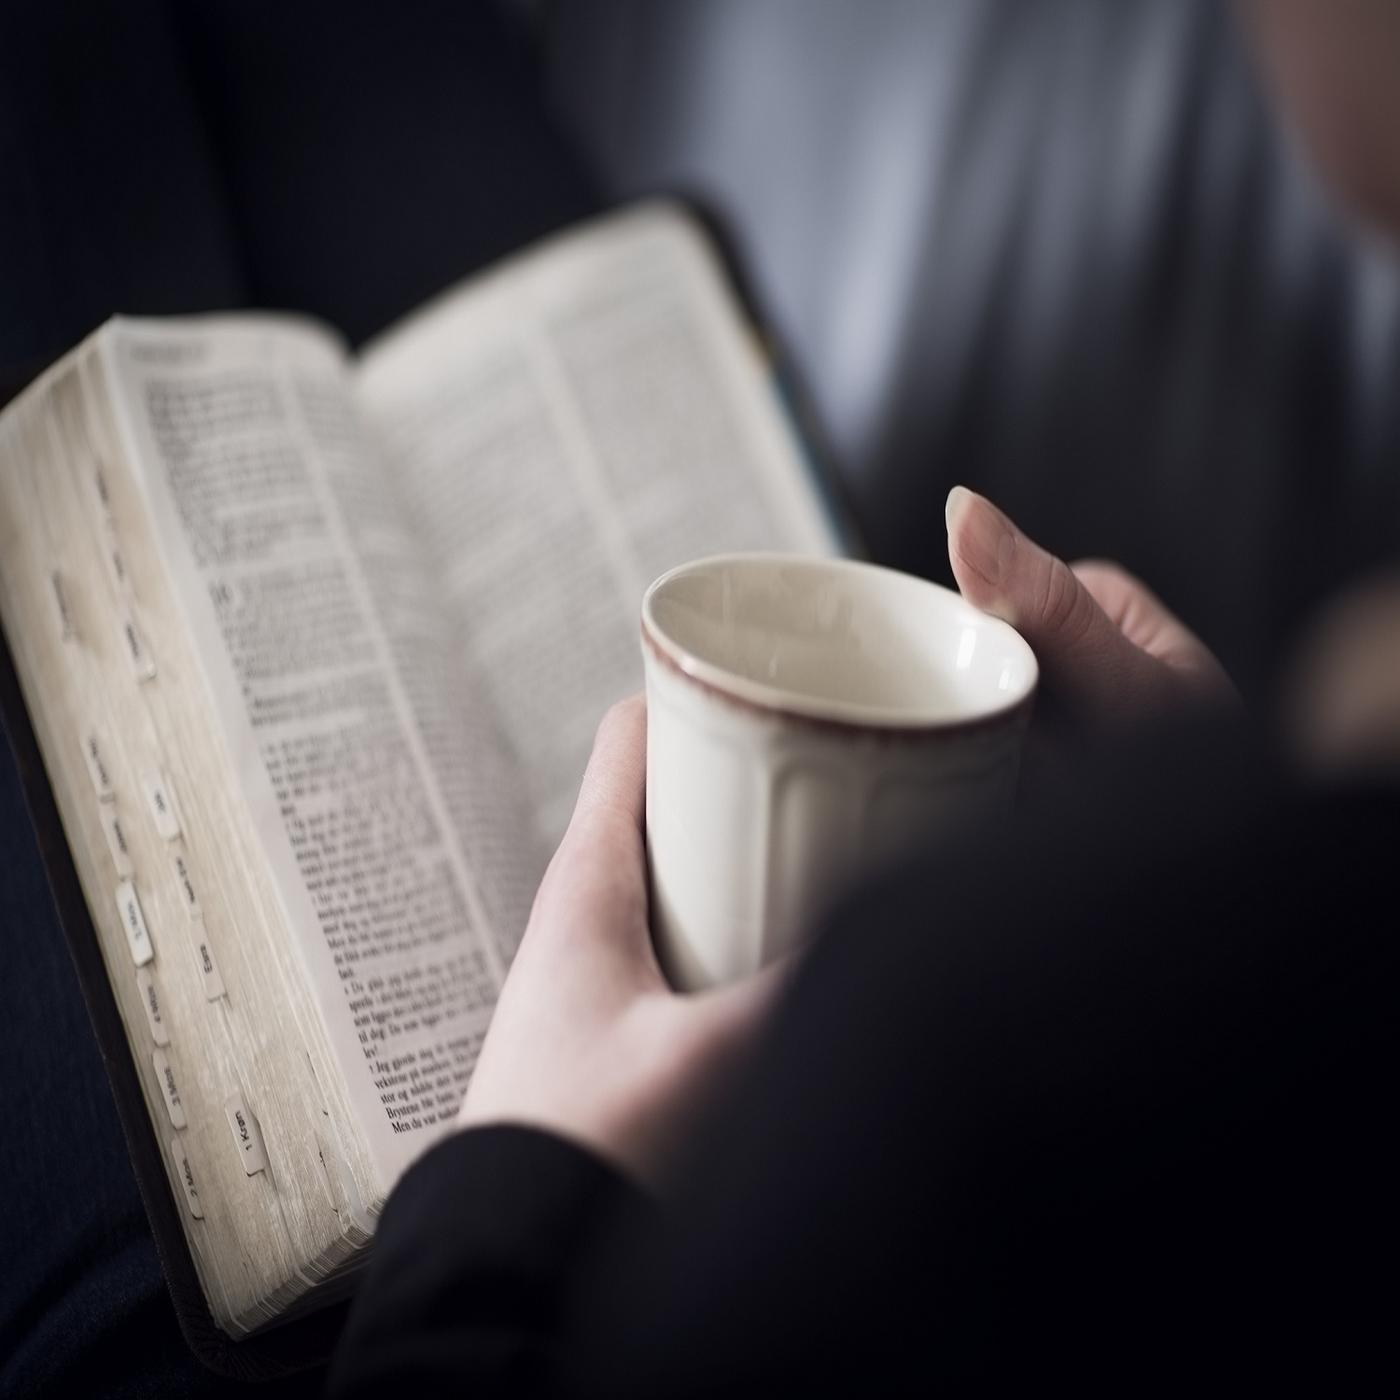 Stouffville Pentecostal Church Sermons (podcast) - Stouffville